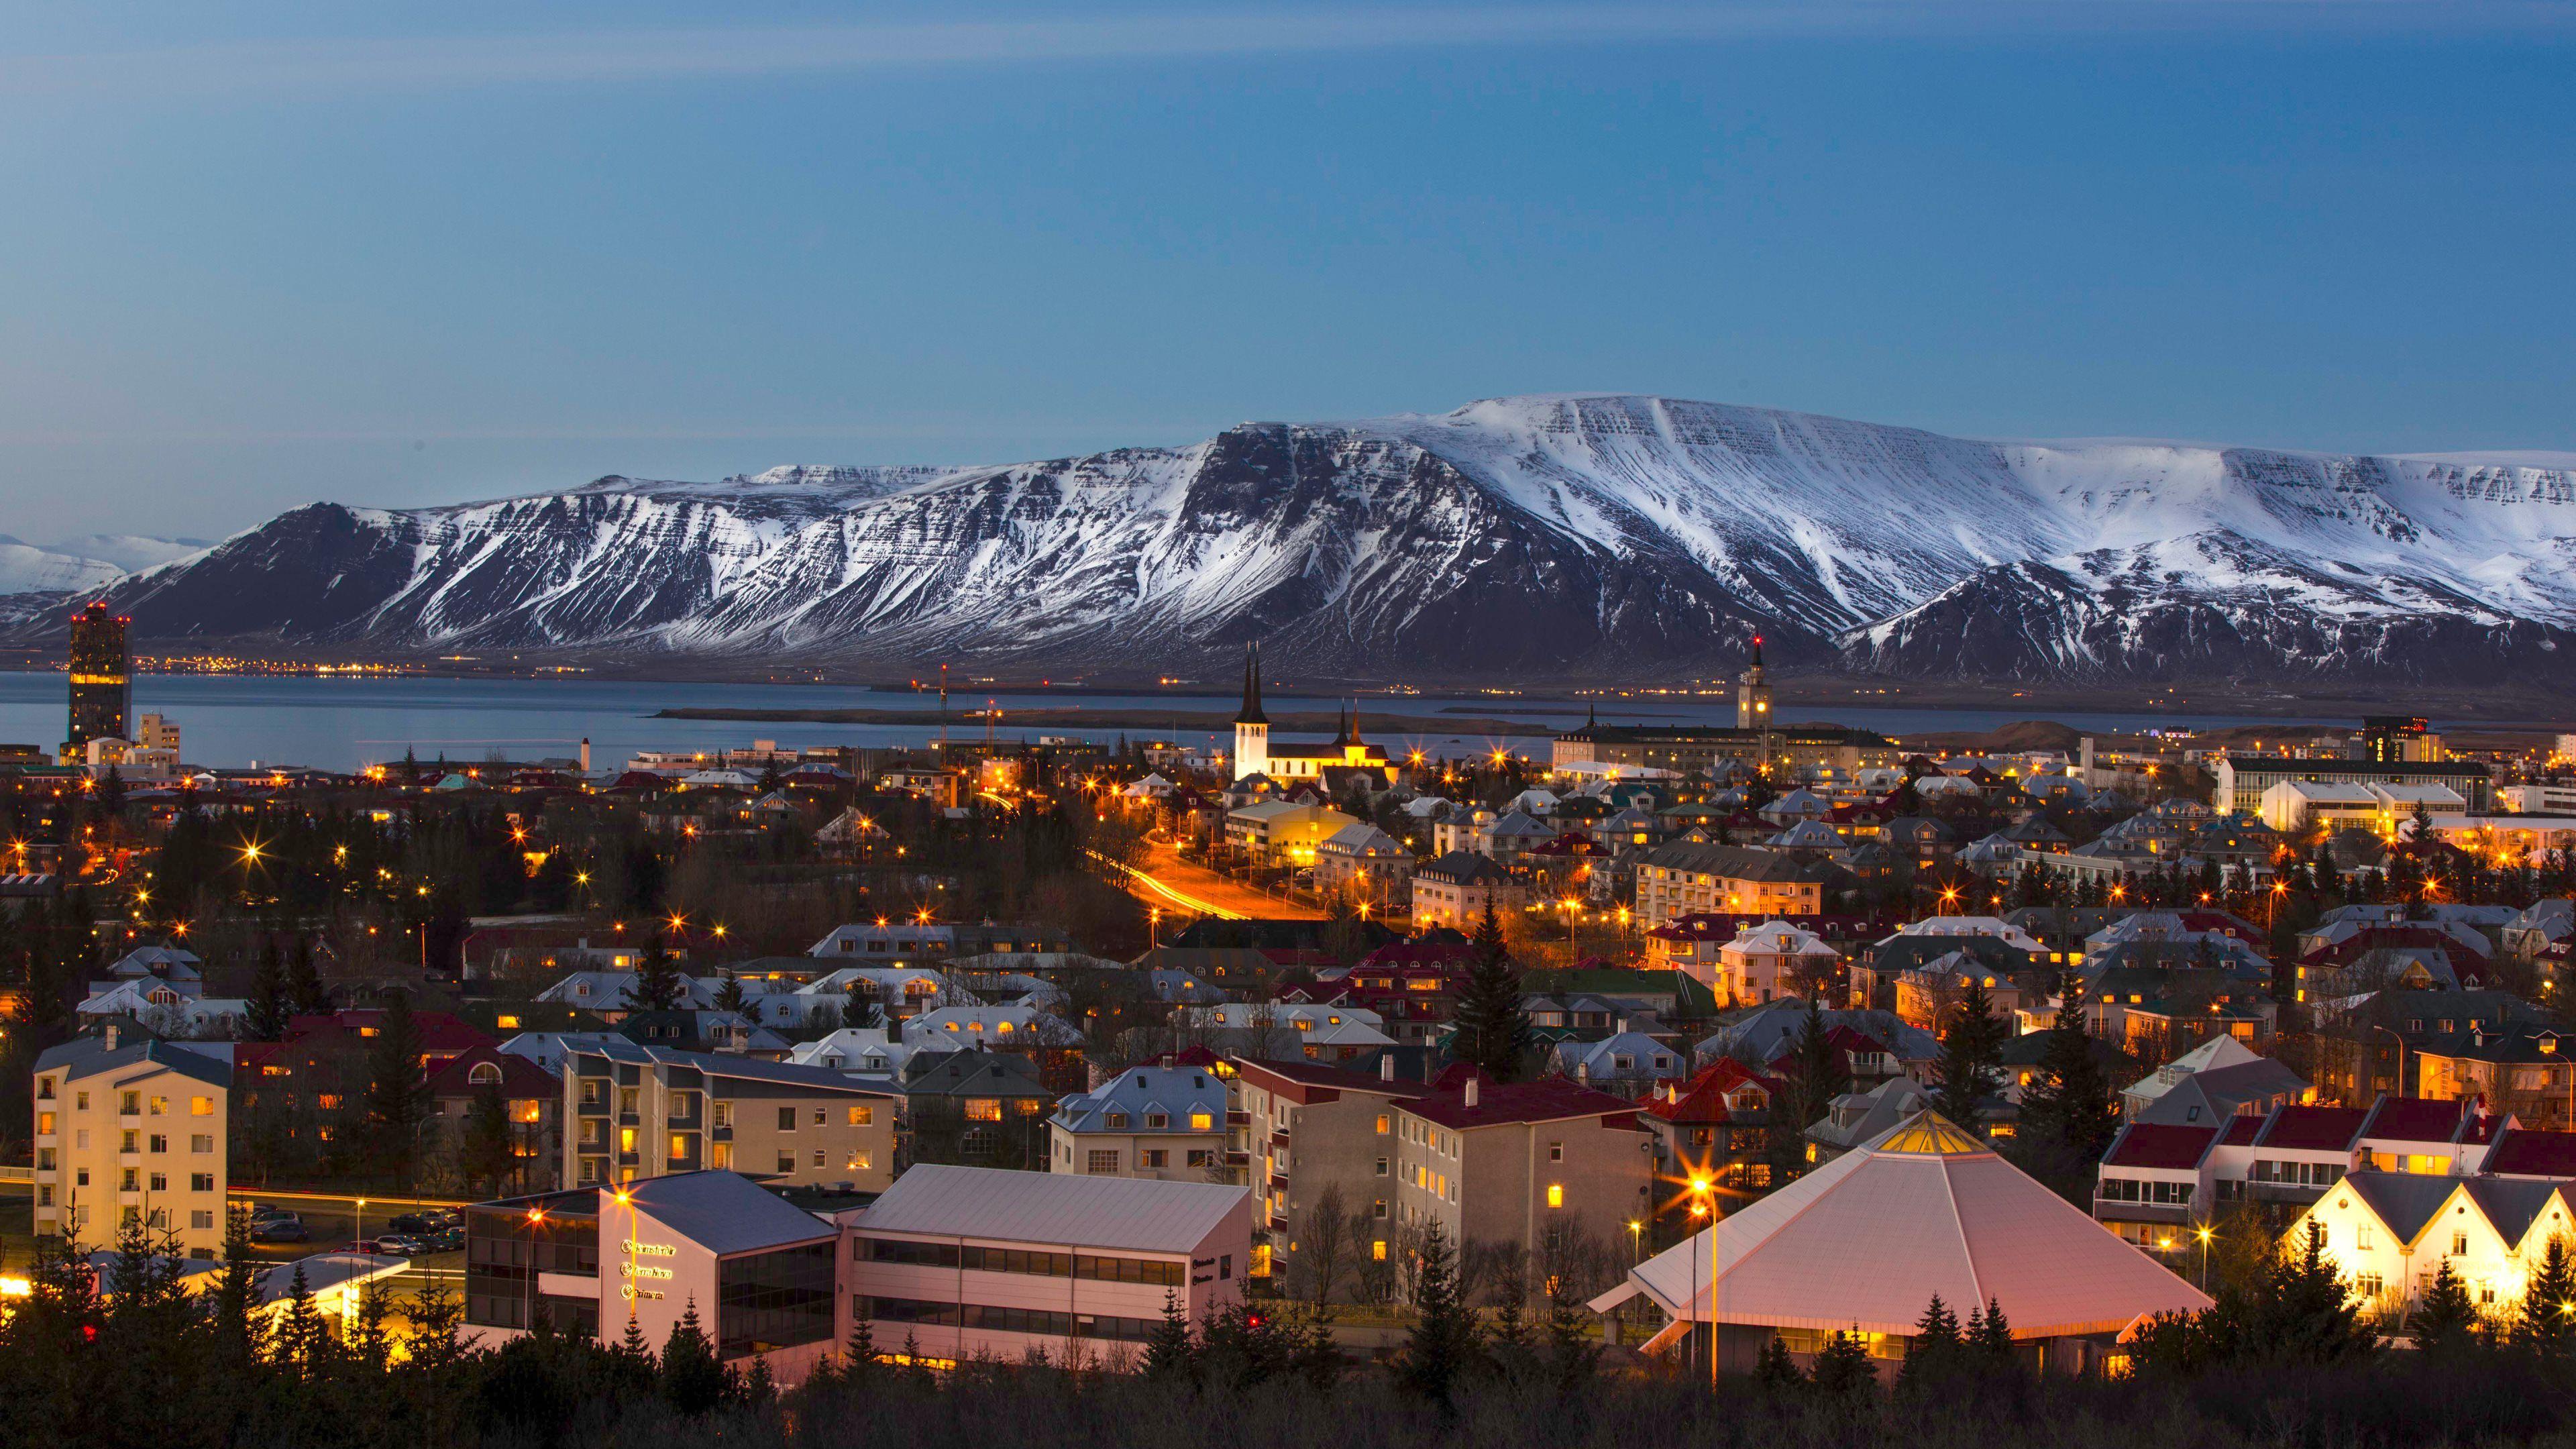 Pin By Reykjavik Reykjavik On Mobile Wallpaper: Landscape 4K Ultra HD Wallpaper